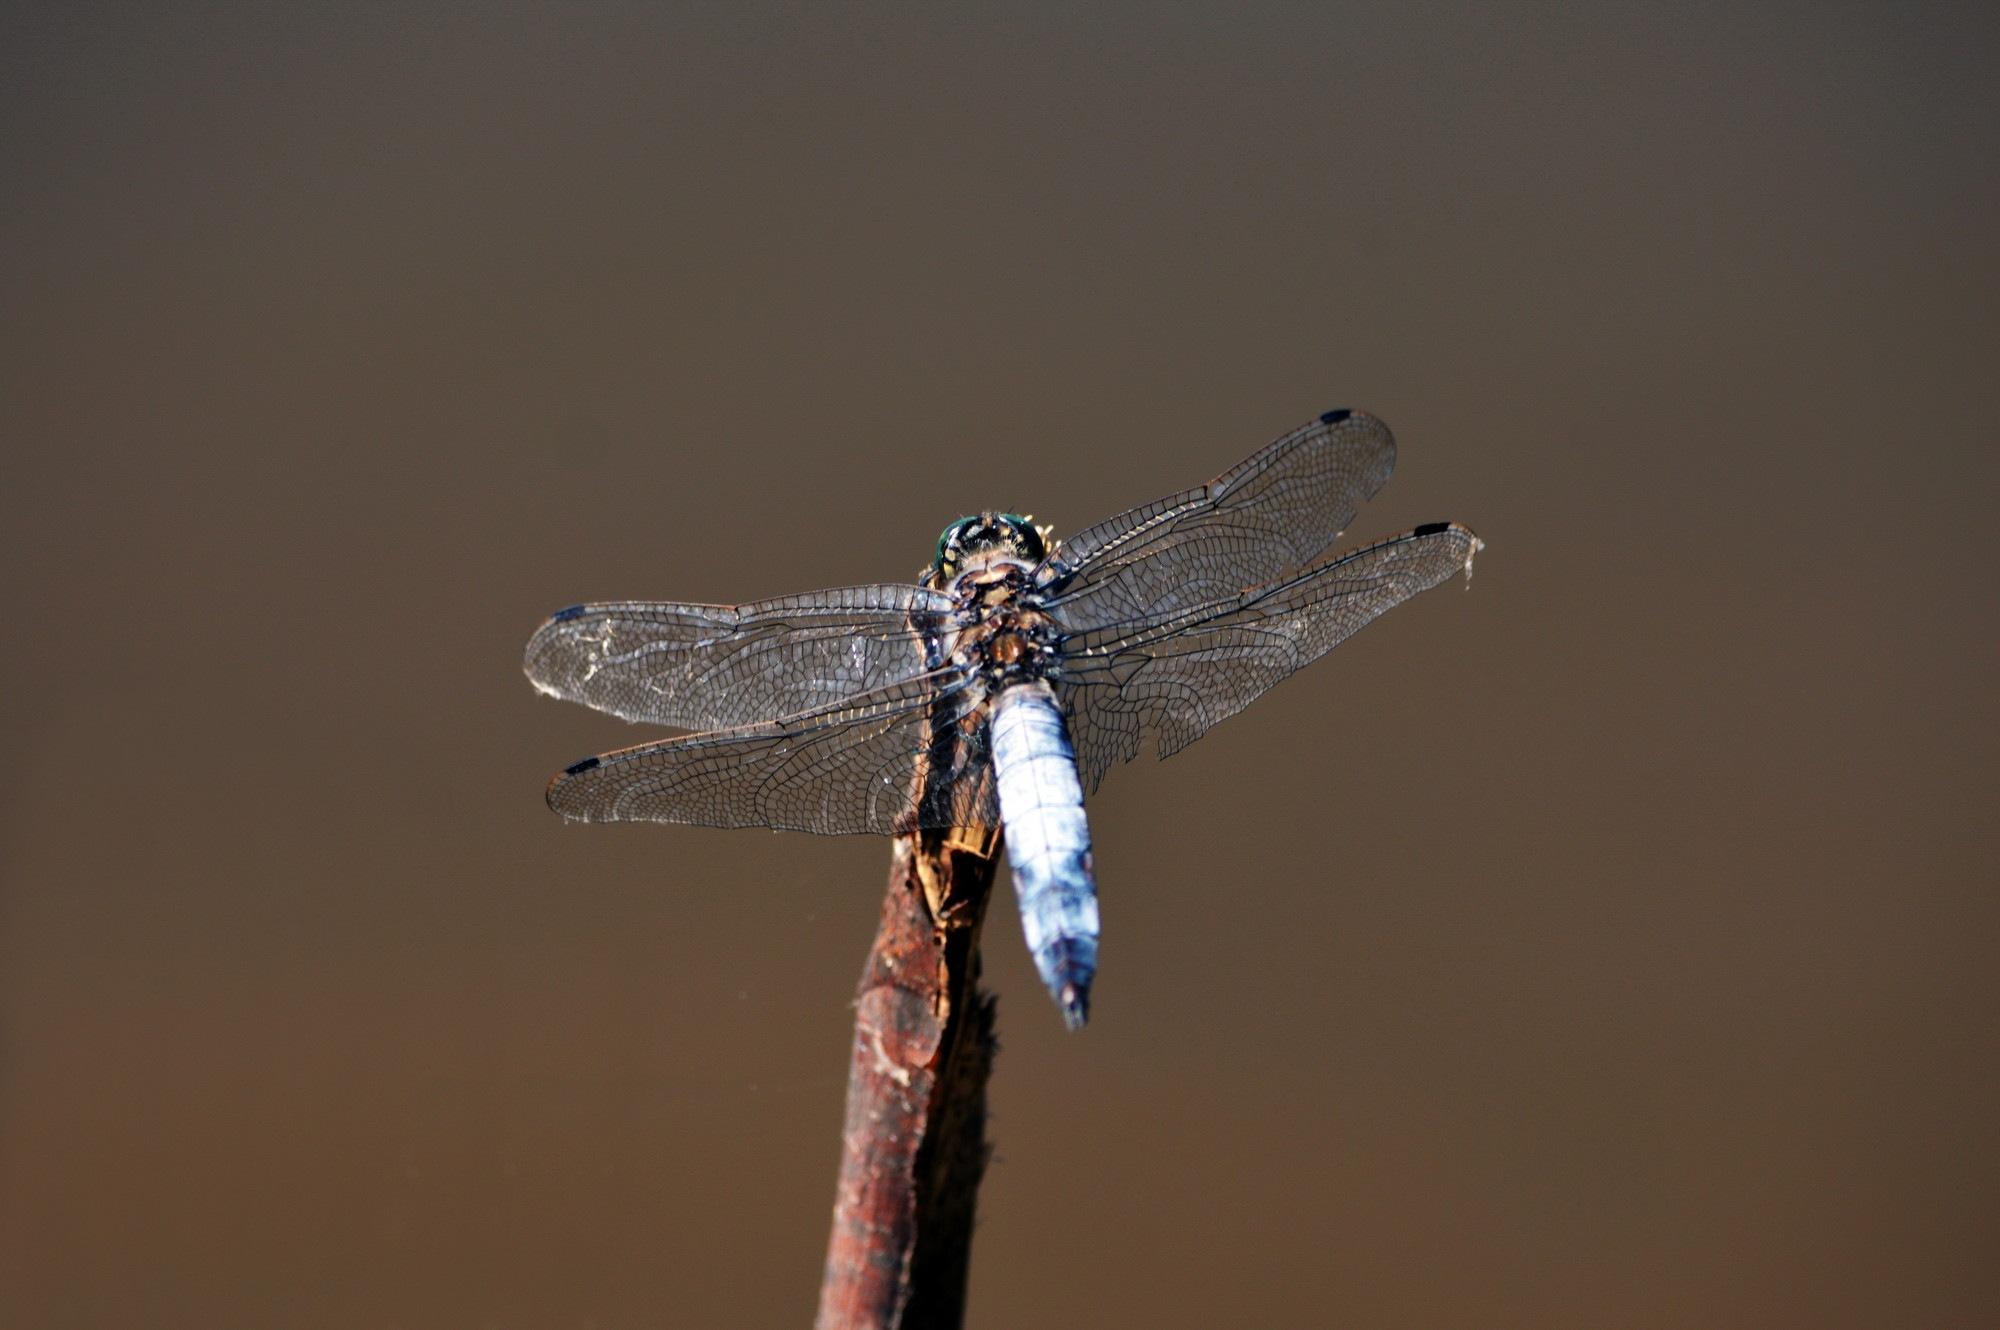 Dragonfly by Iulian Bud